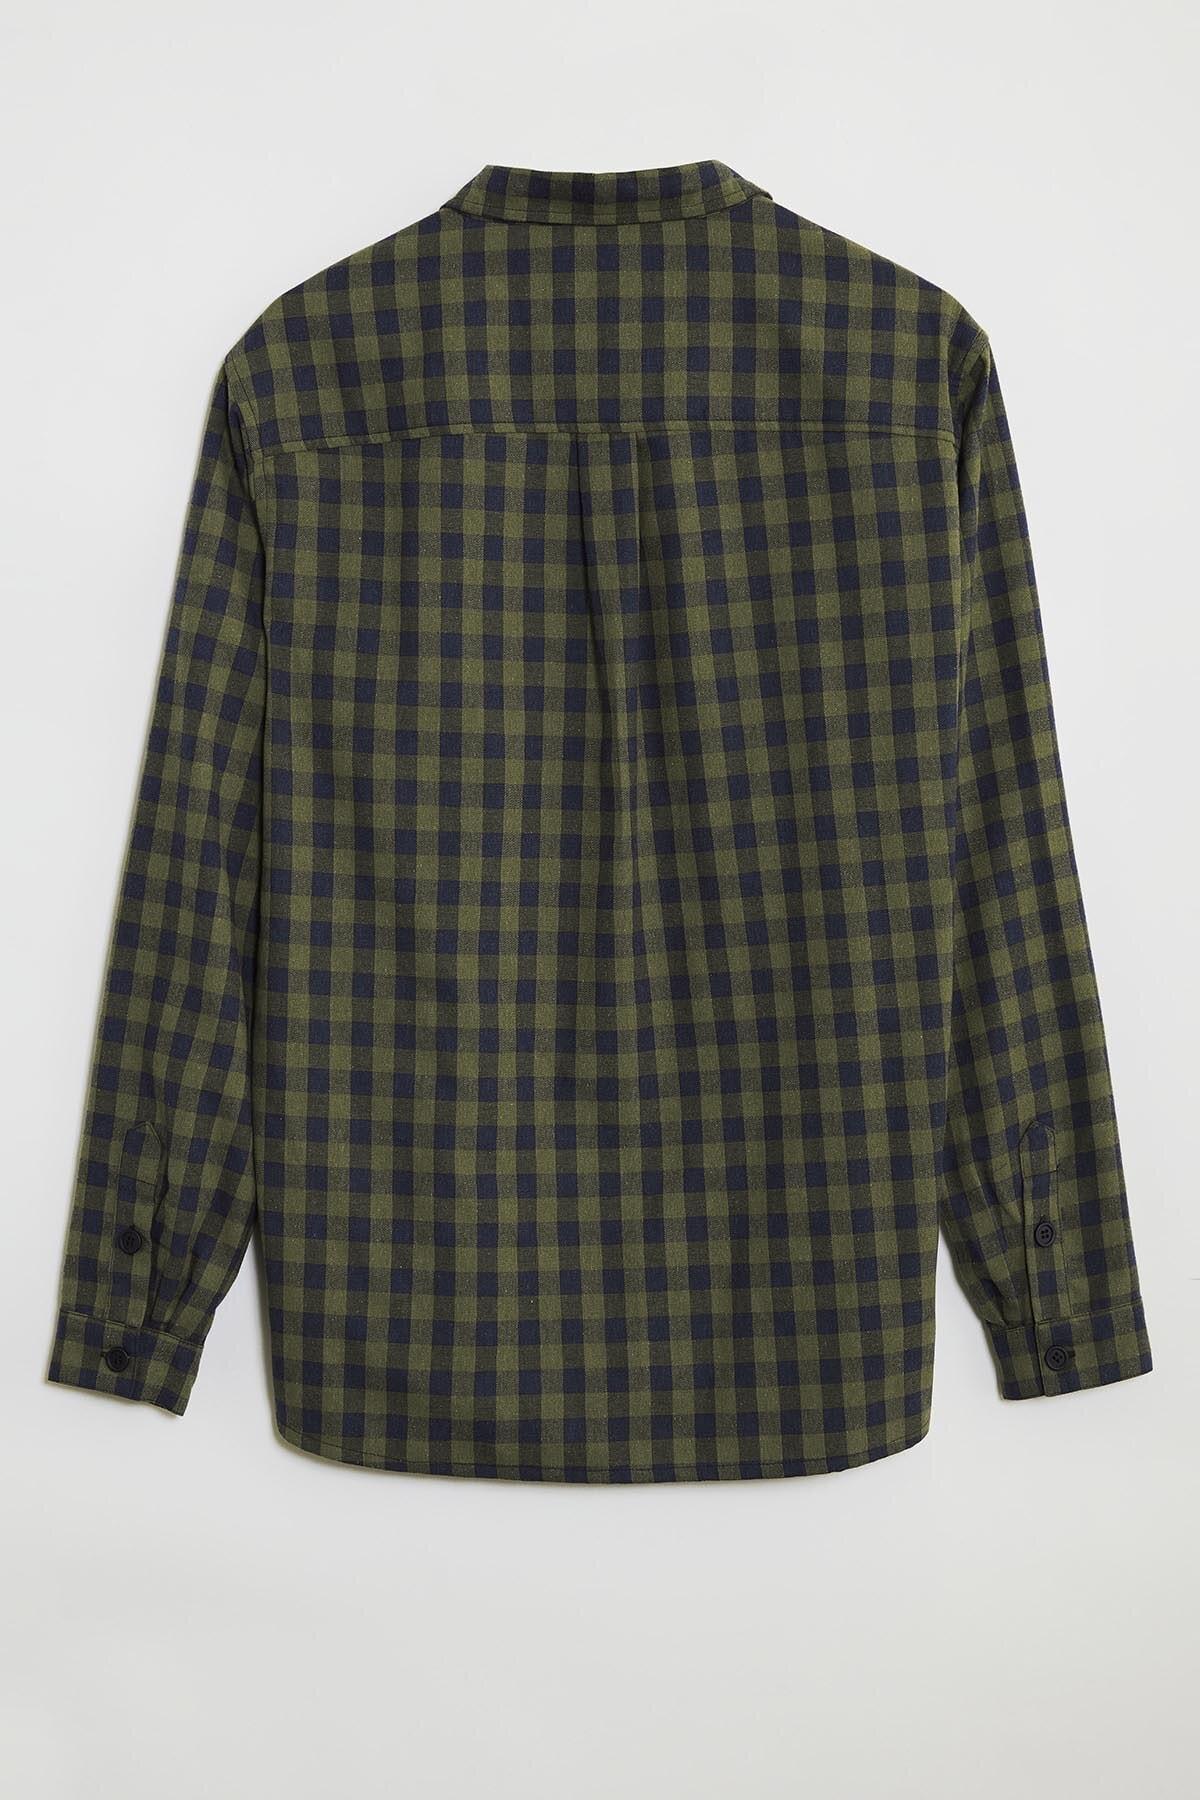 GRIMELANGE BRETT Erkek Yeşil Kareli Regular Gömlek 3